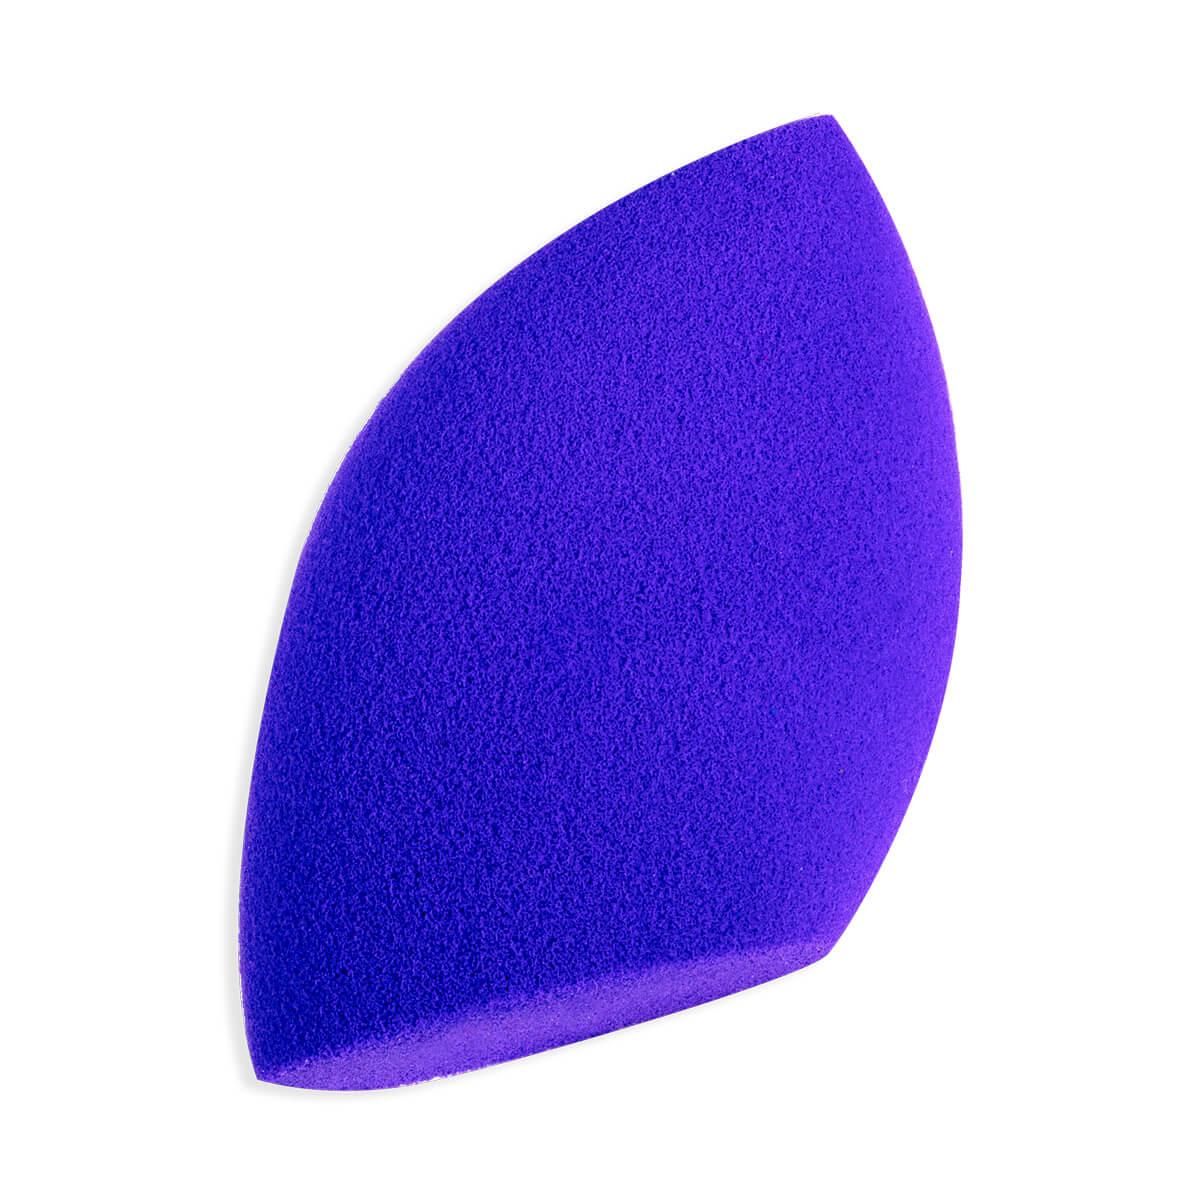 Esponja Gota Chanfrada R818 Sffumato Beauty